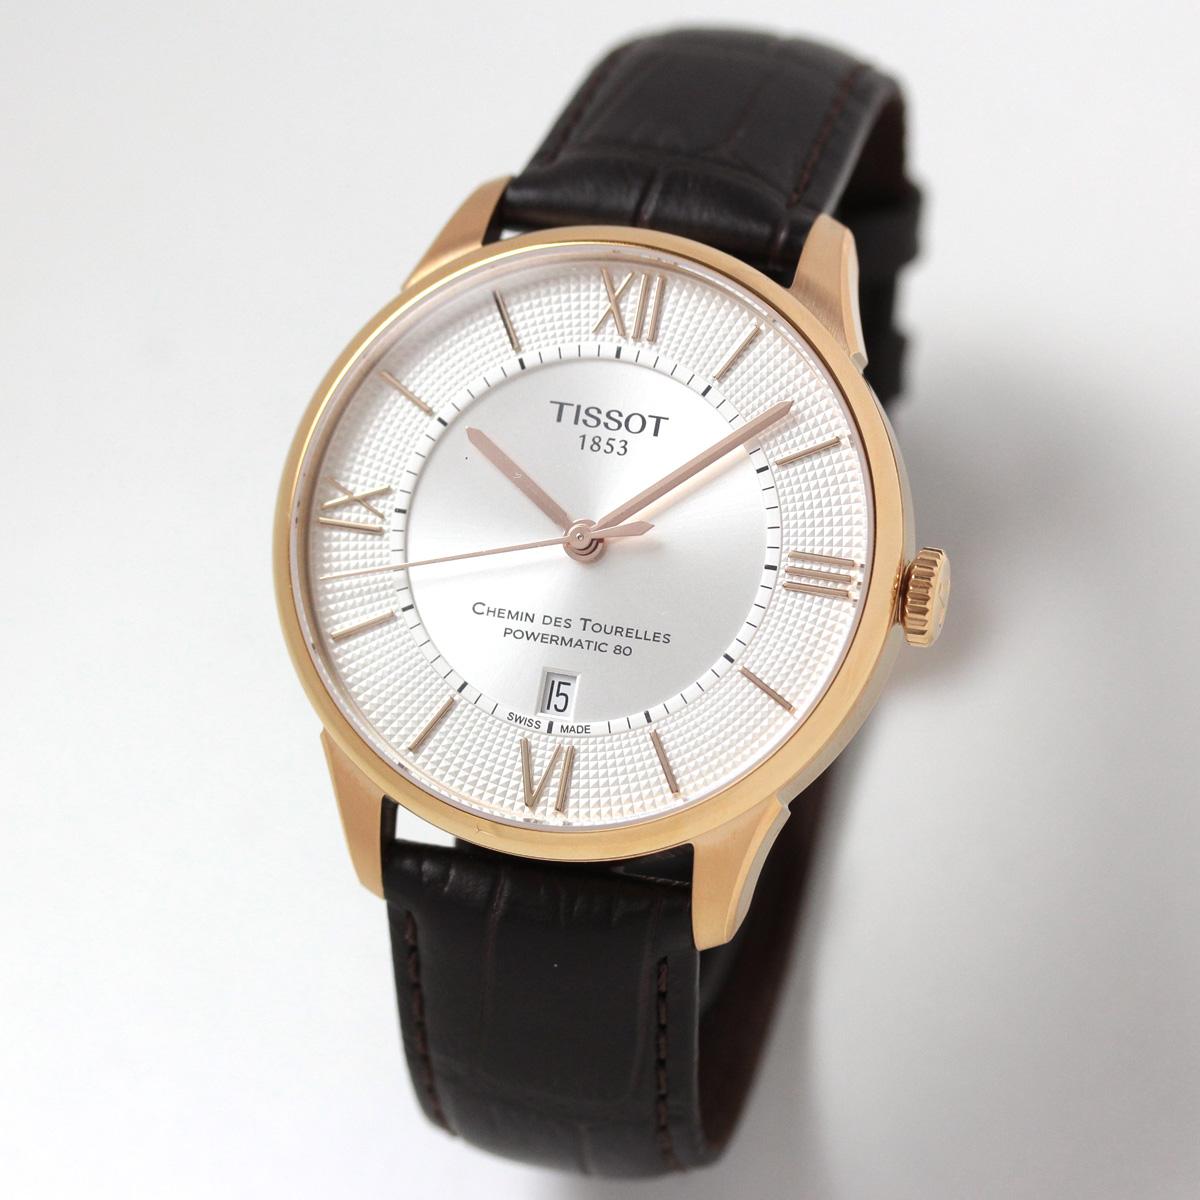 Tissot(ティソ) CHEMIN DES TOURELLES  (シャミン・ド・トゥレル )t0994073603800